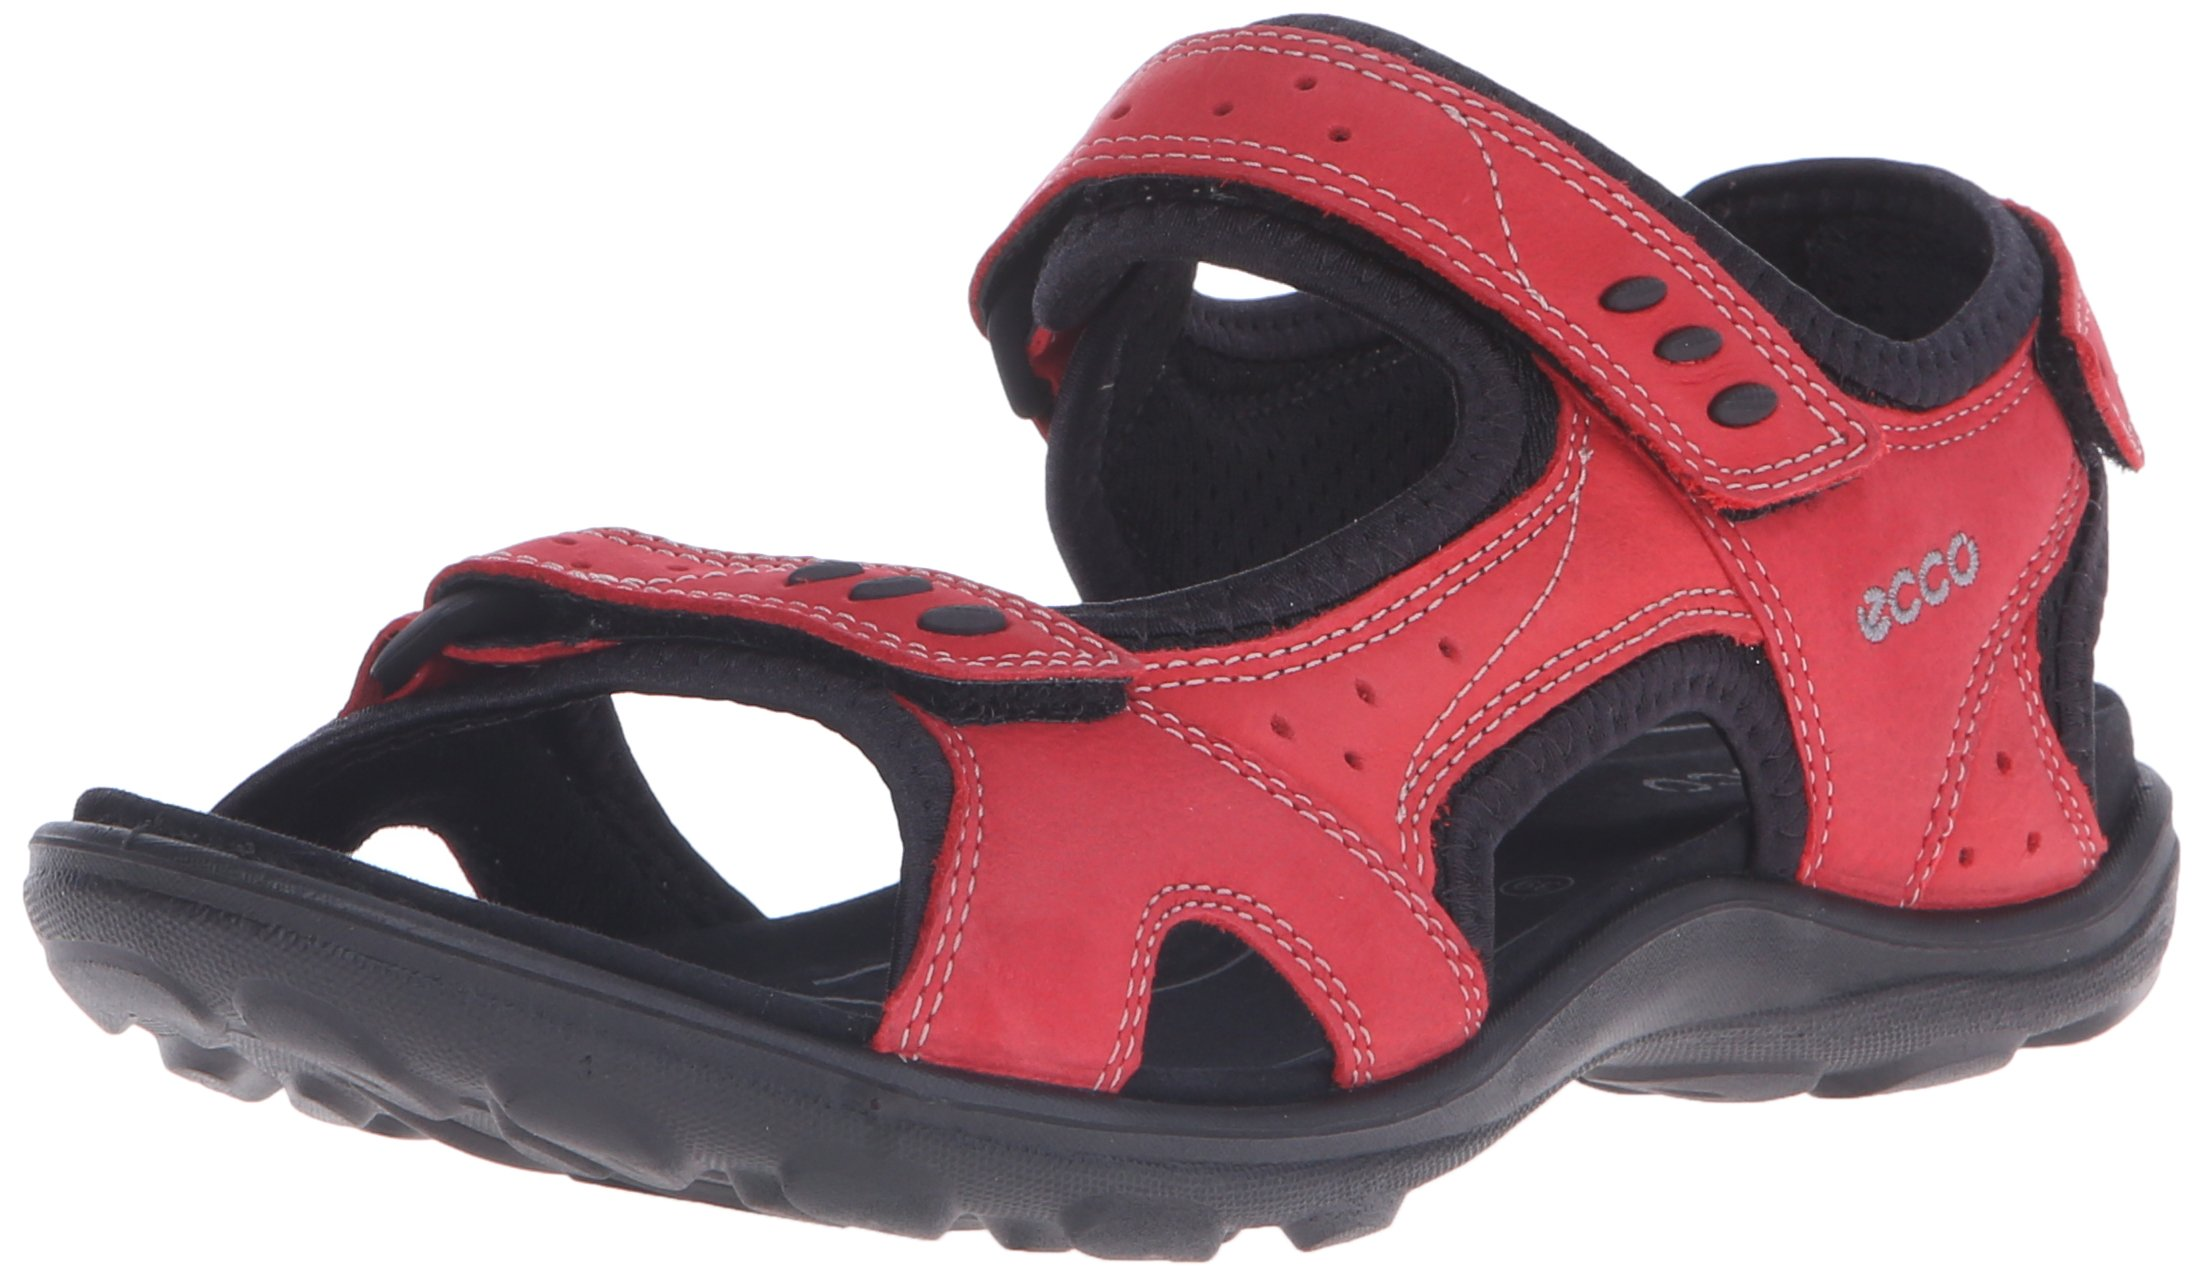 ECCO Women's Kana Sport Sandal, Chili Red, 41 EU/10-10.5 M US